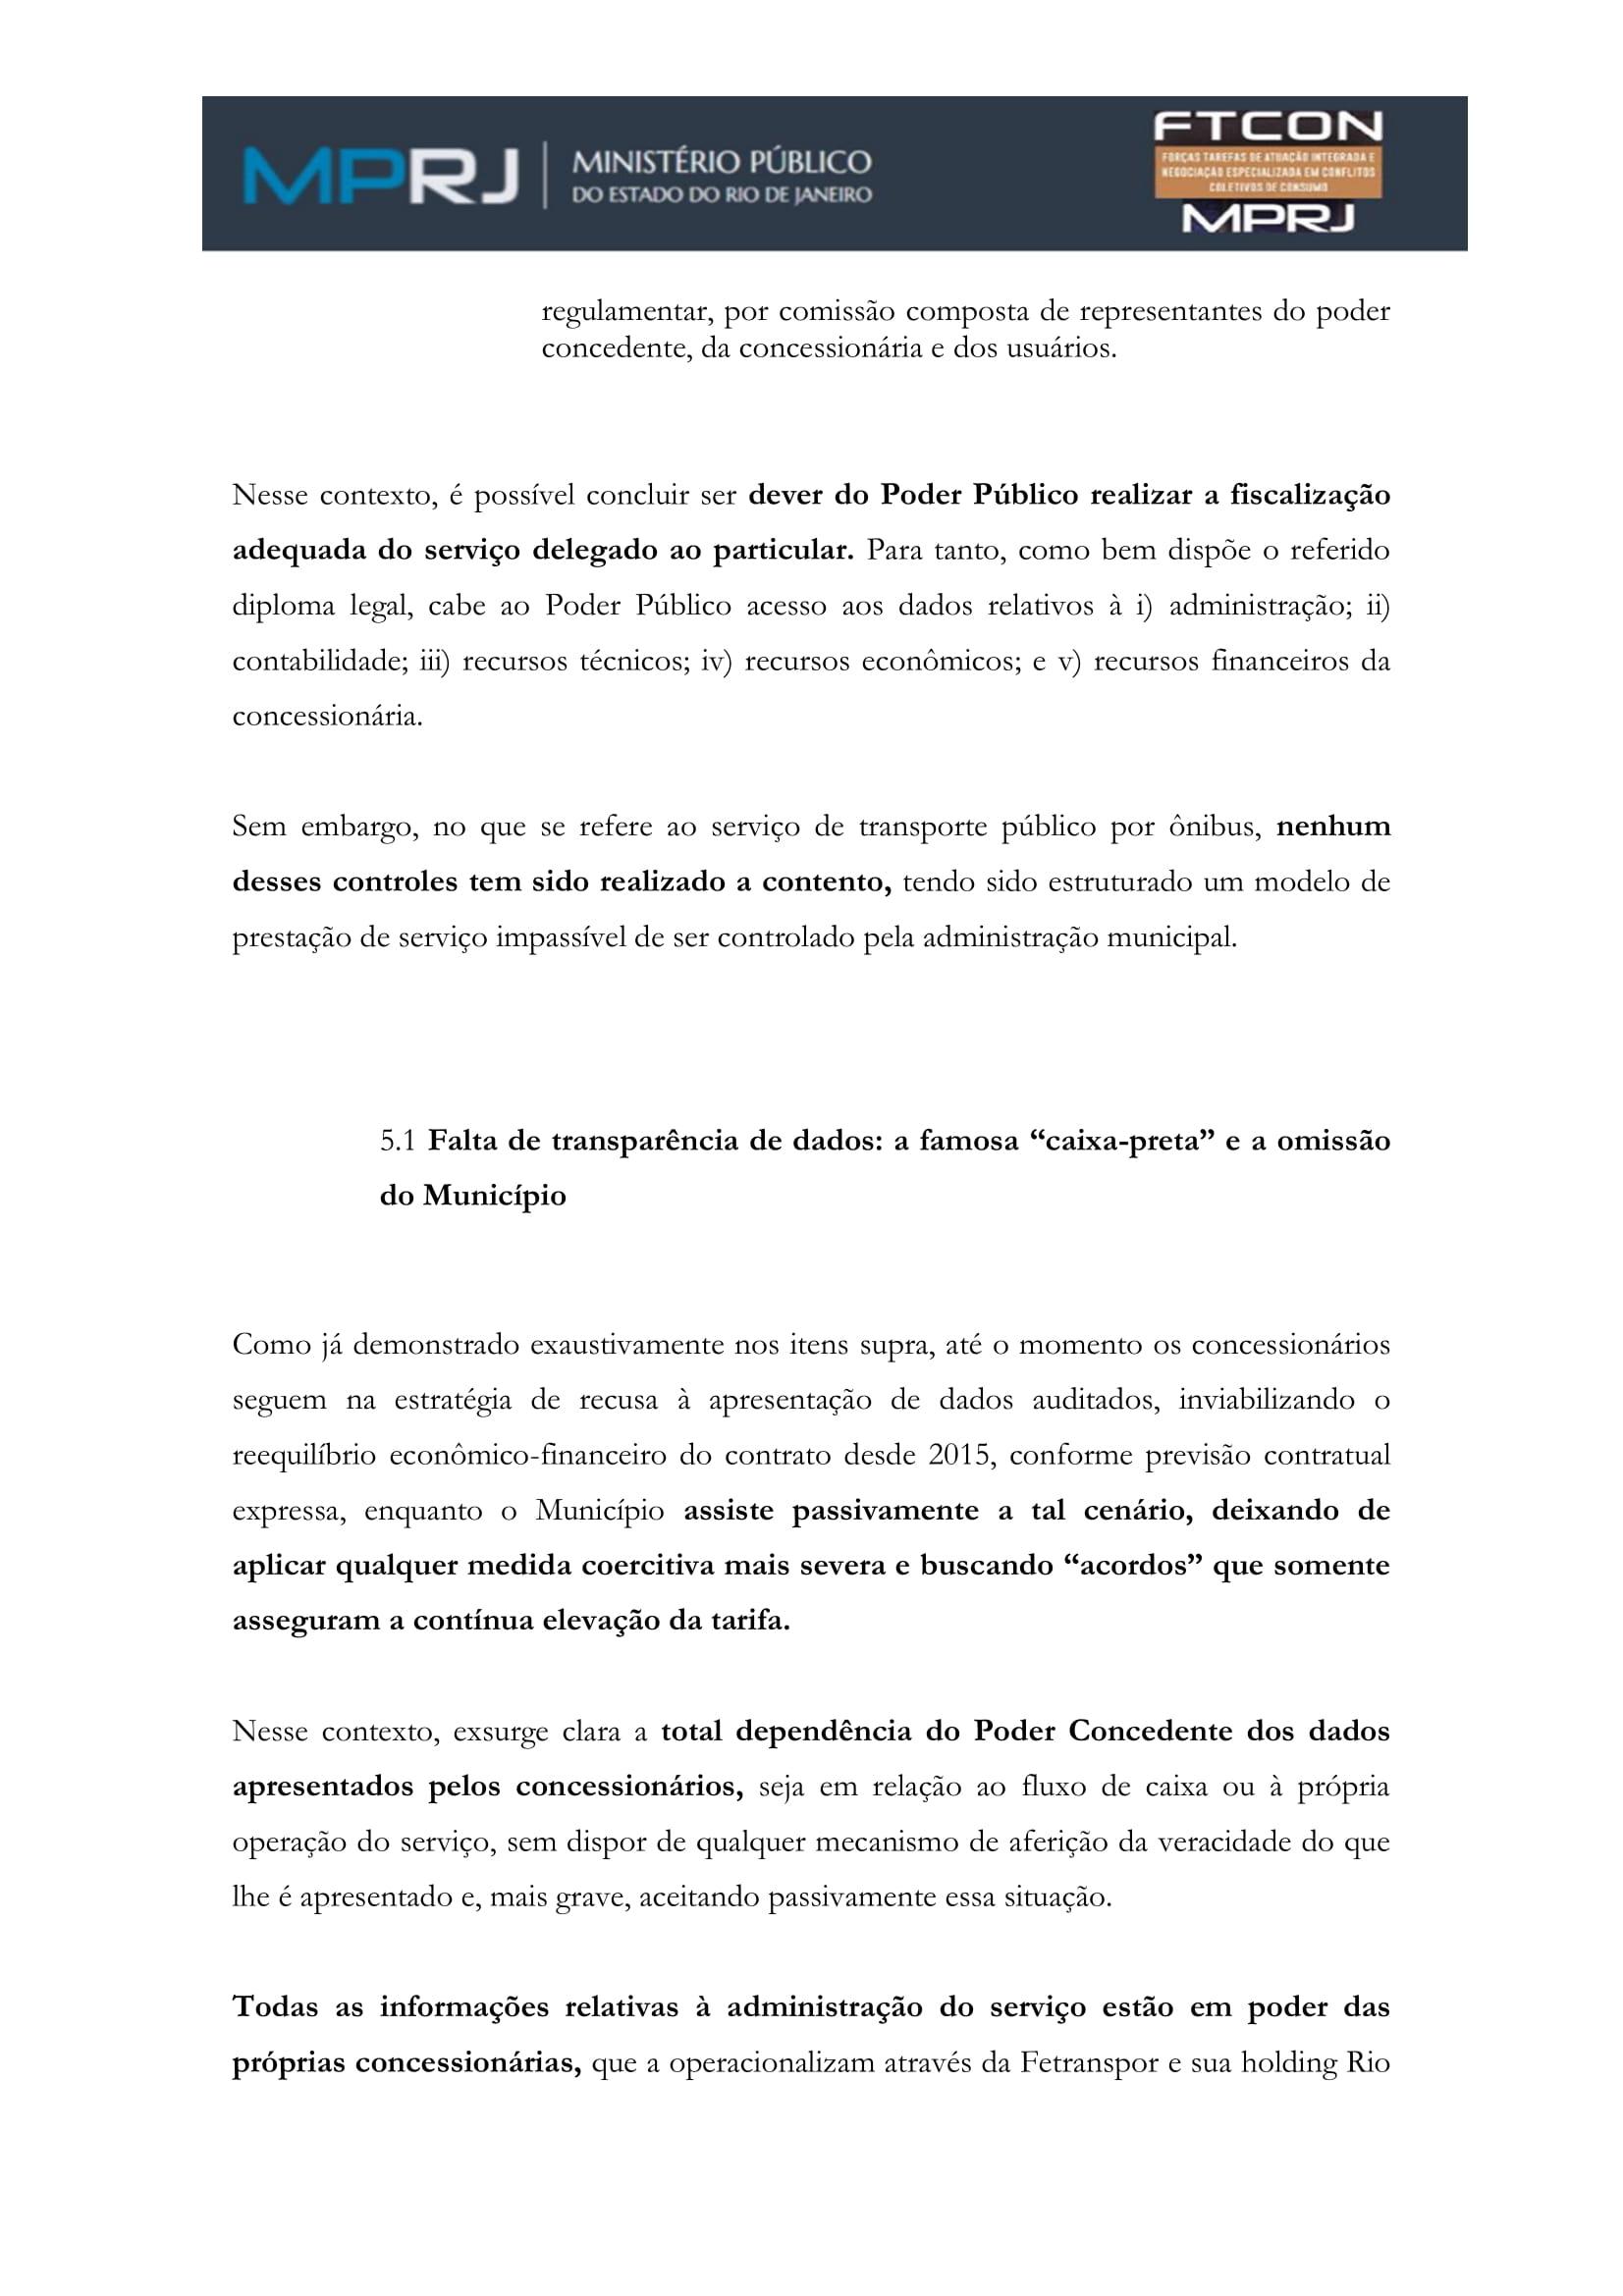 acp_caducidade_onibus_dr_rt-102